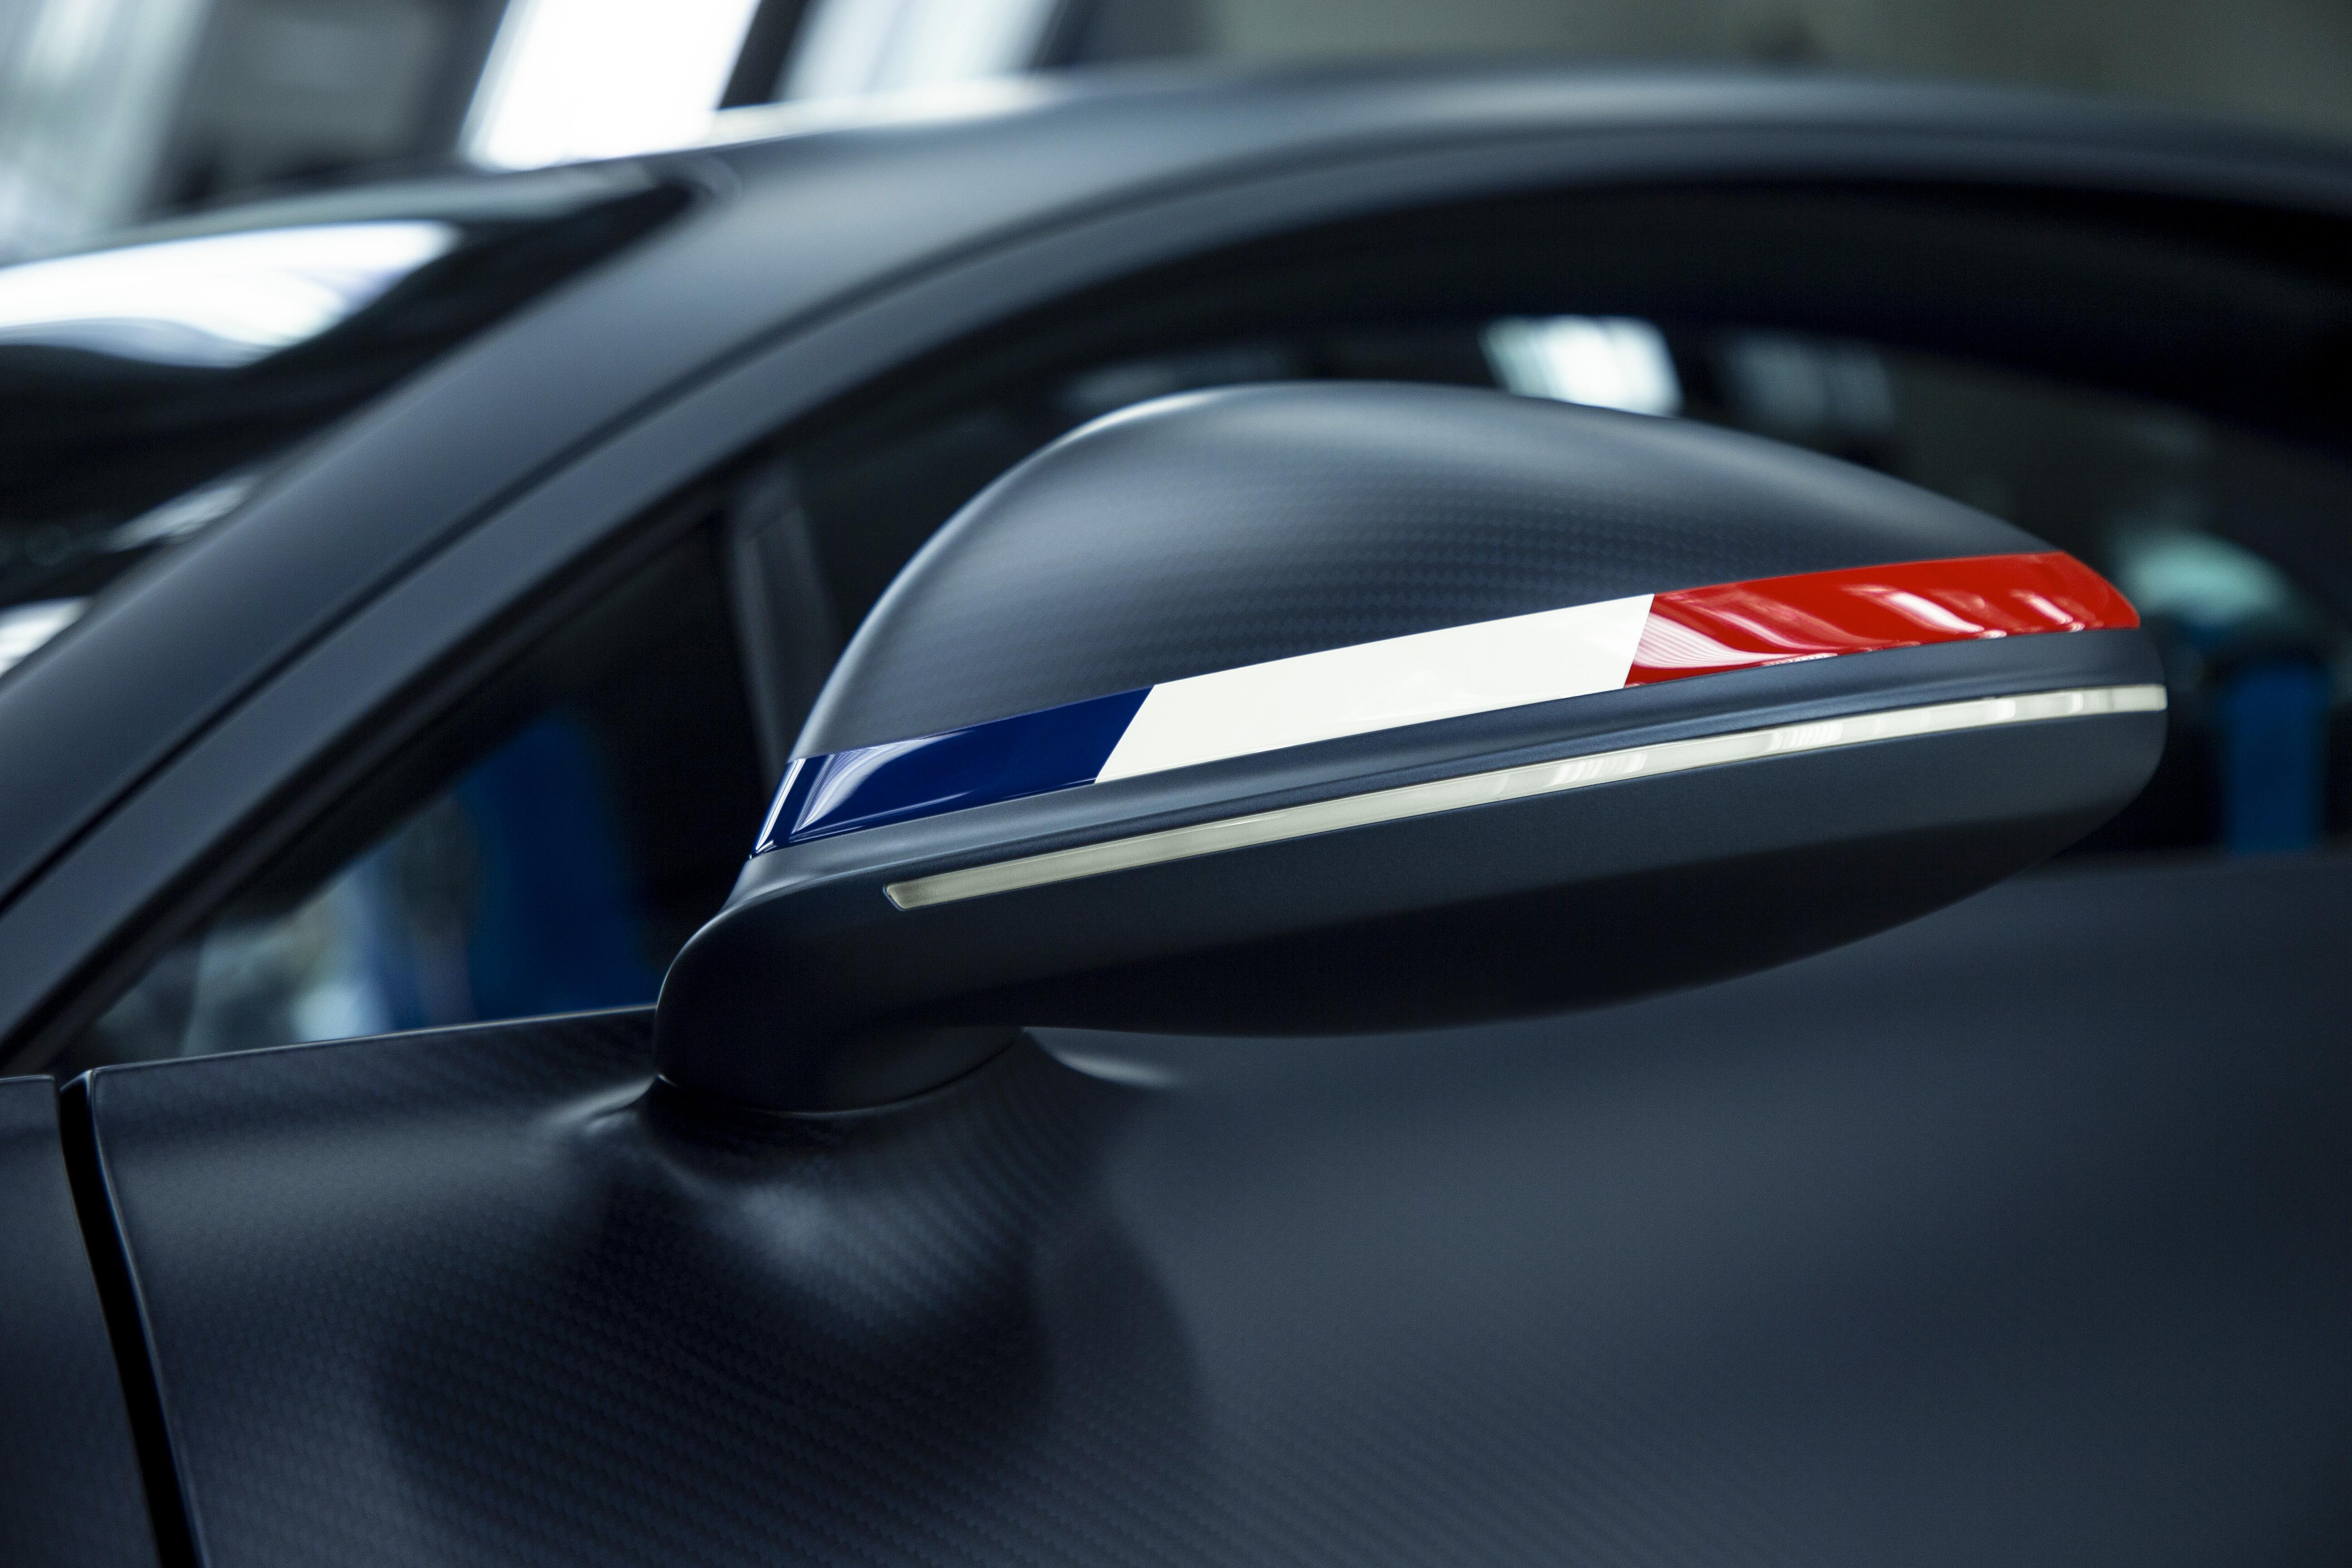 bugatti-chiron-sport-110-ans-bugatti-12.jpg